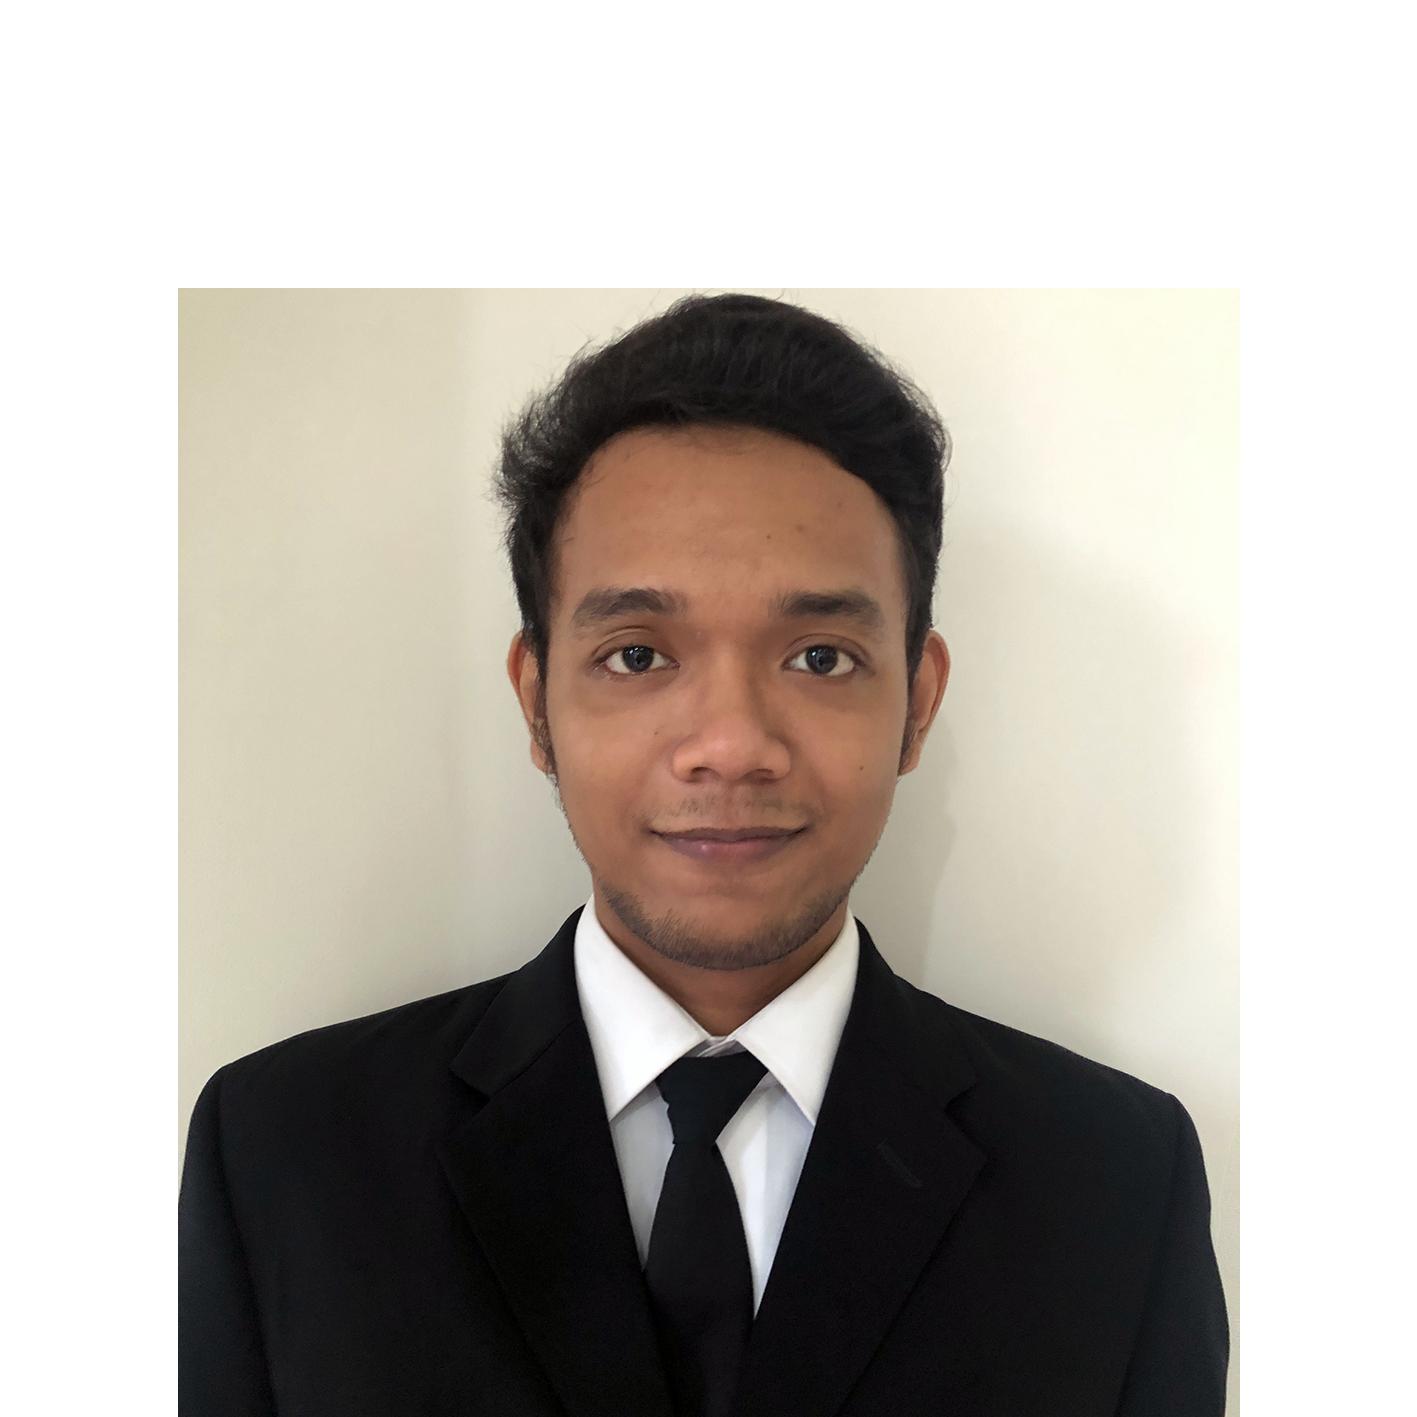 Yohanes Dewa Bayu Adyawadhana